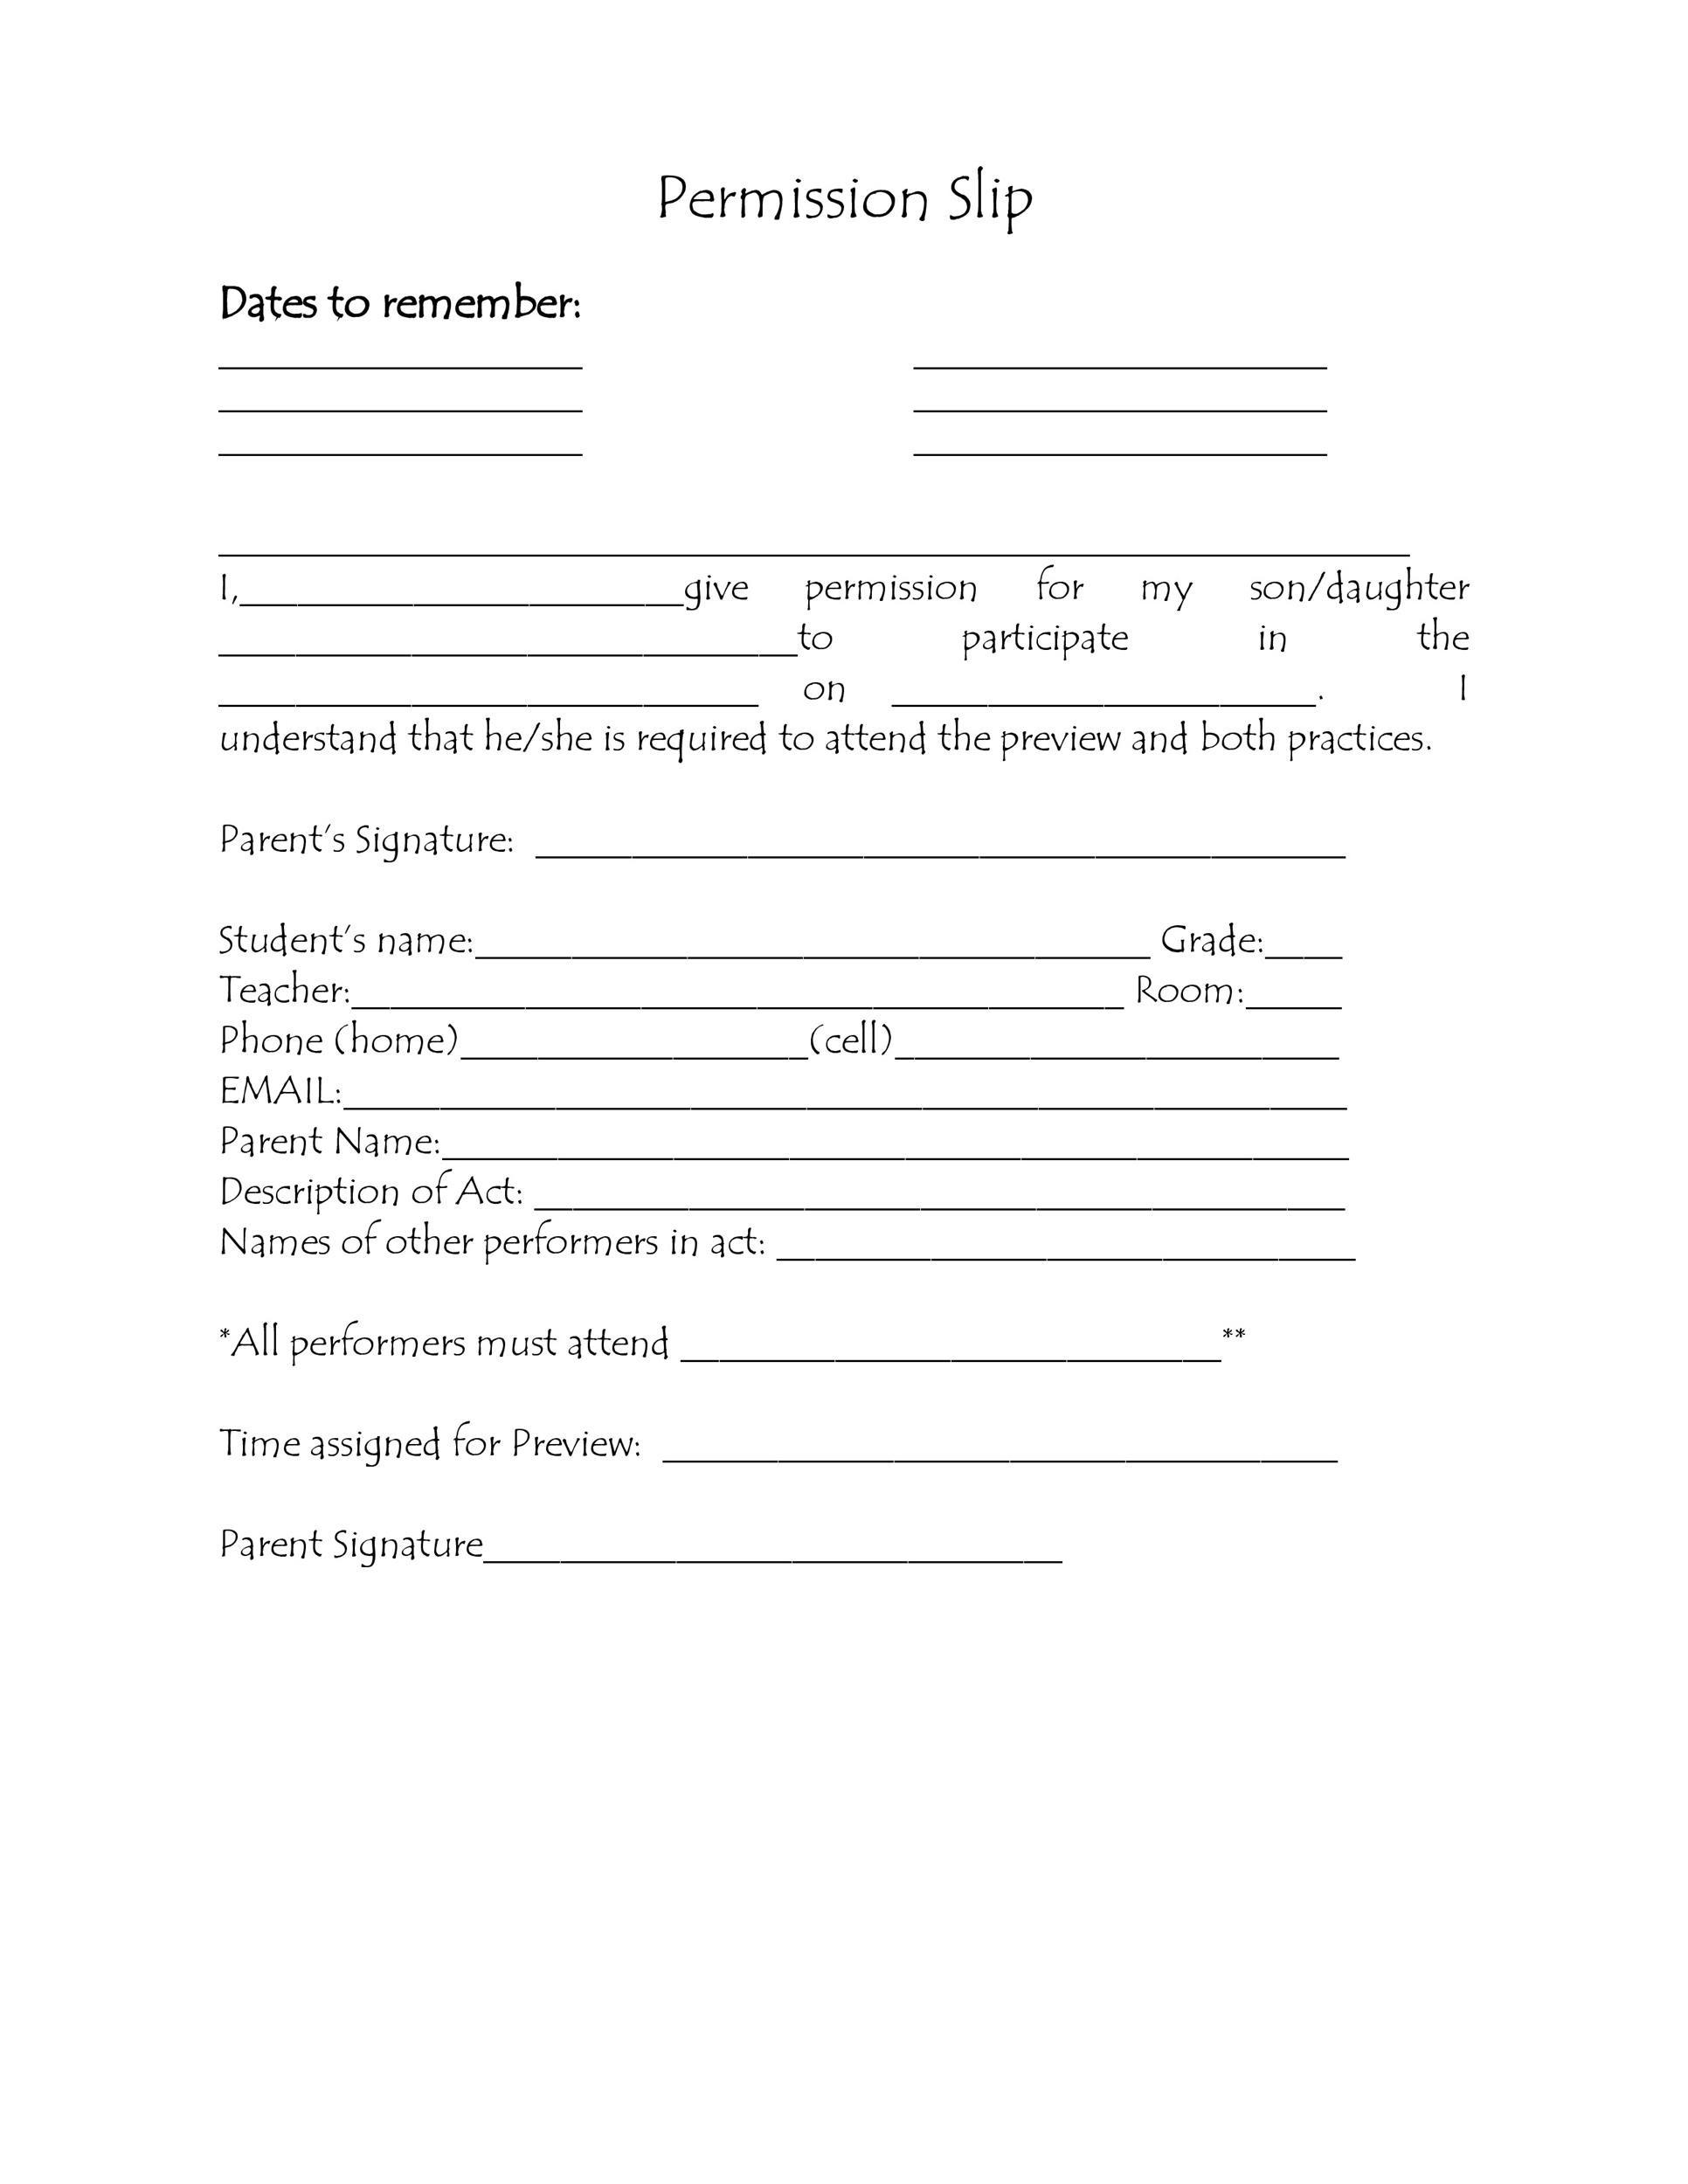 Free Permission Slip 27